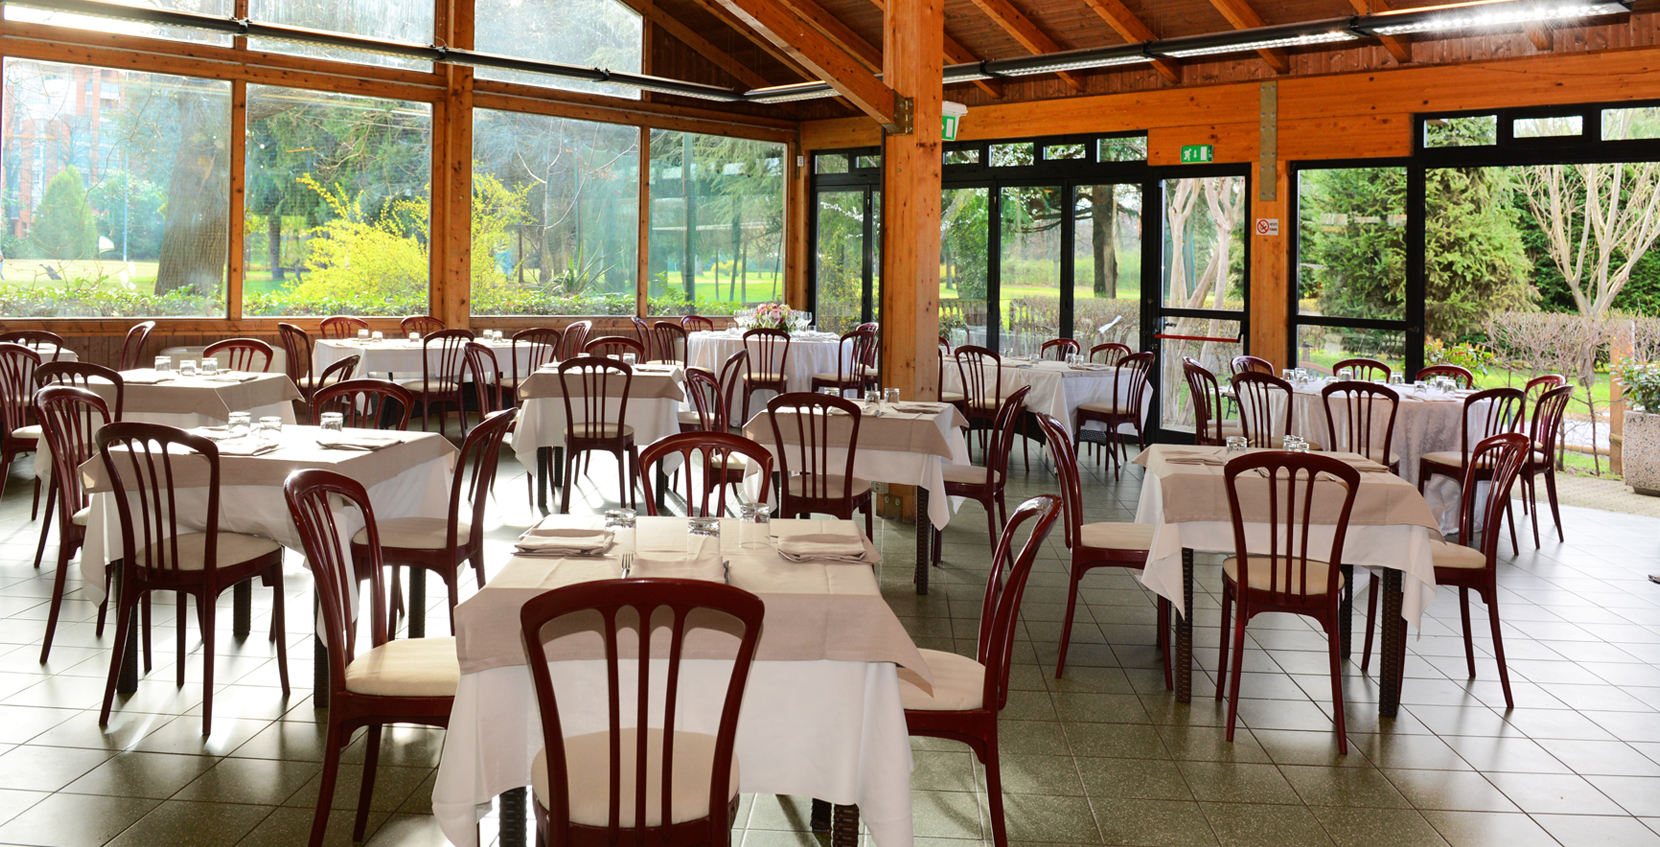 Sala ristorante per eventi C.B. Catering & Banqueting